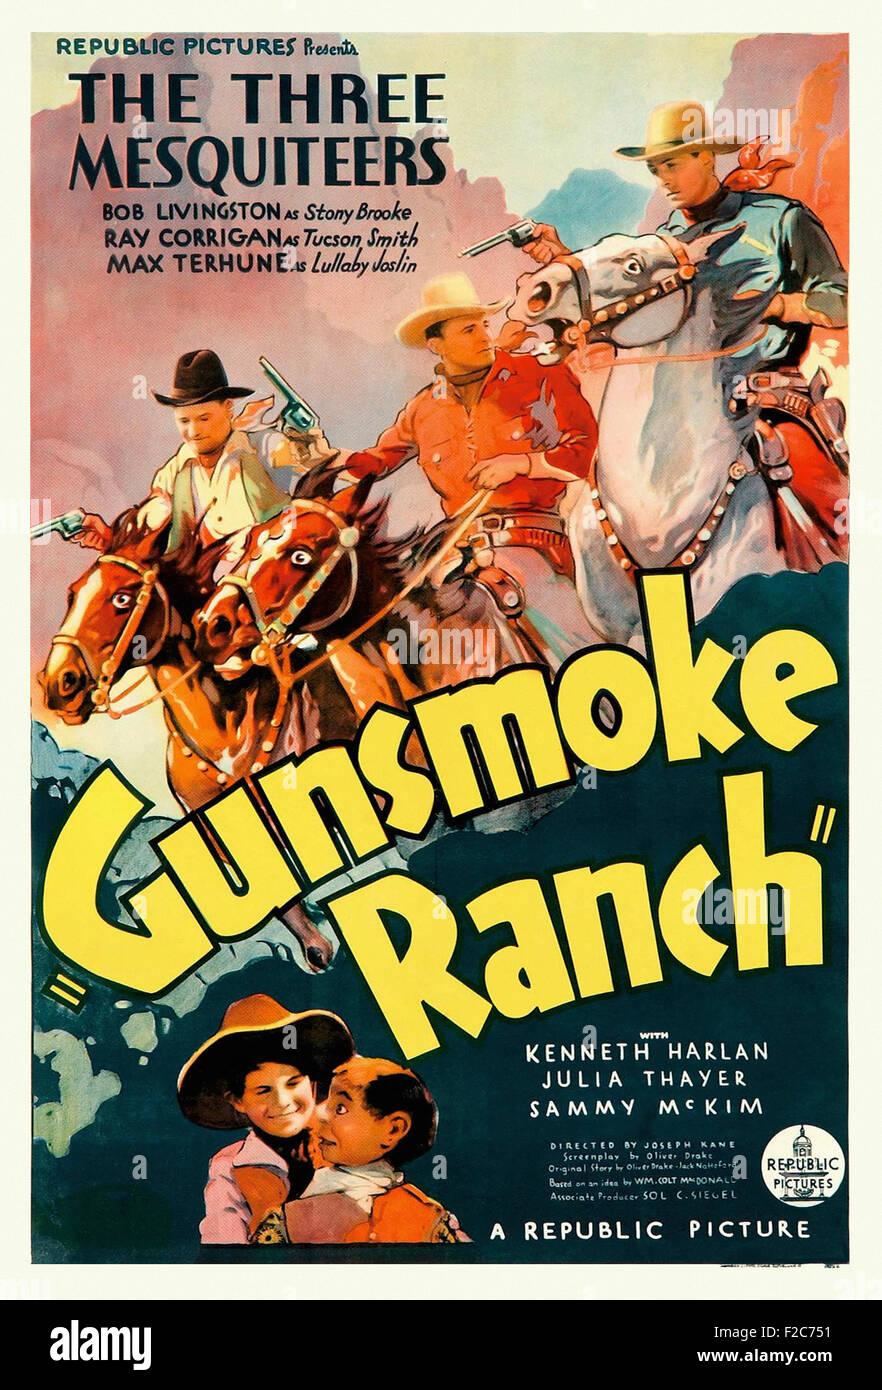 Gunsmoke Ranch 01 - Movie Poster Stock Photo: 87550205 - Alamy